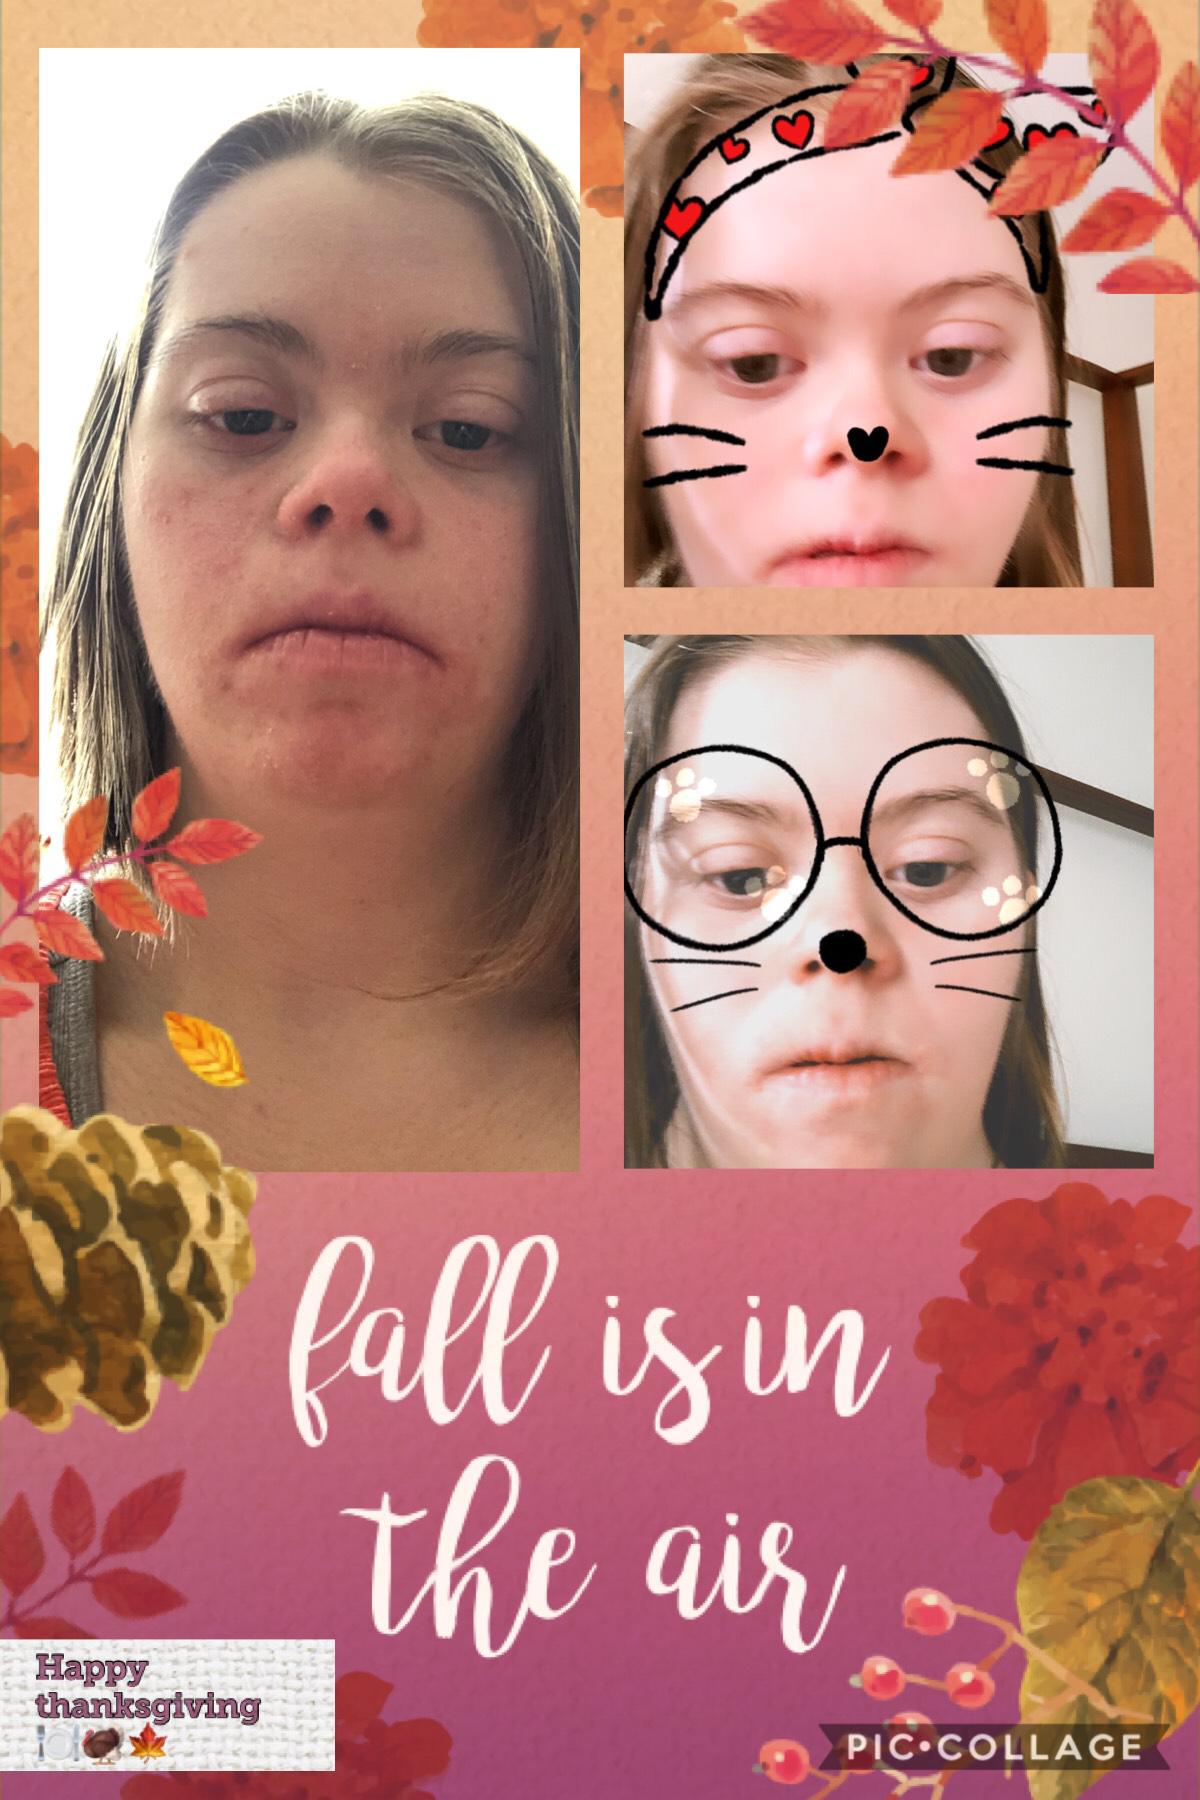 Happy thanksgiving 🍽🍁🦃 everybody